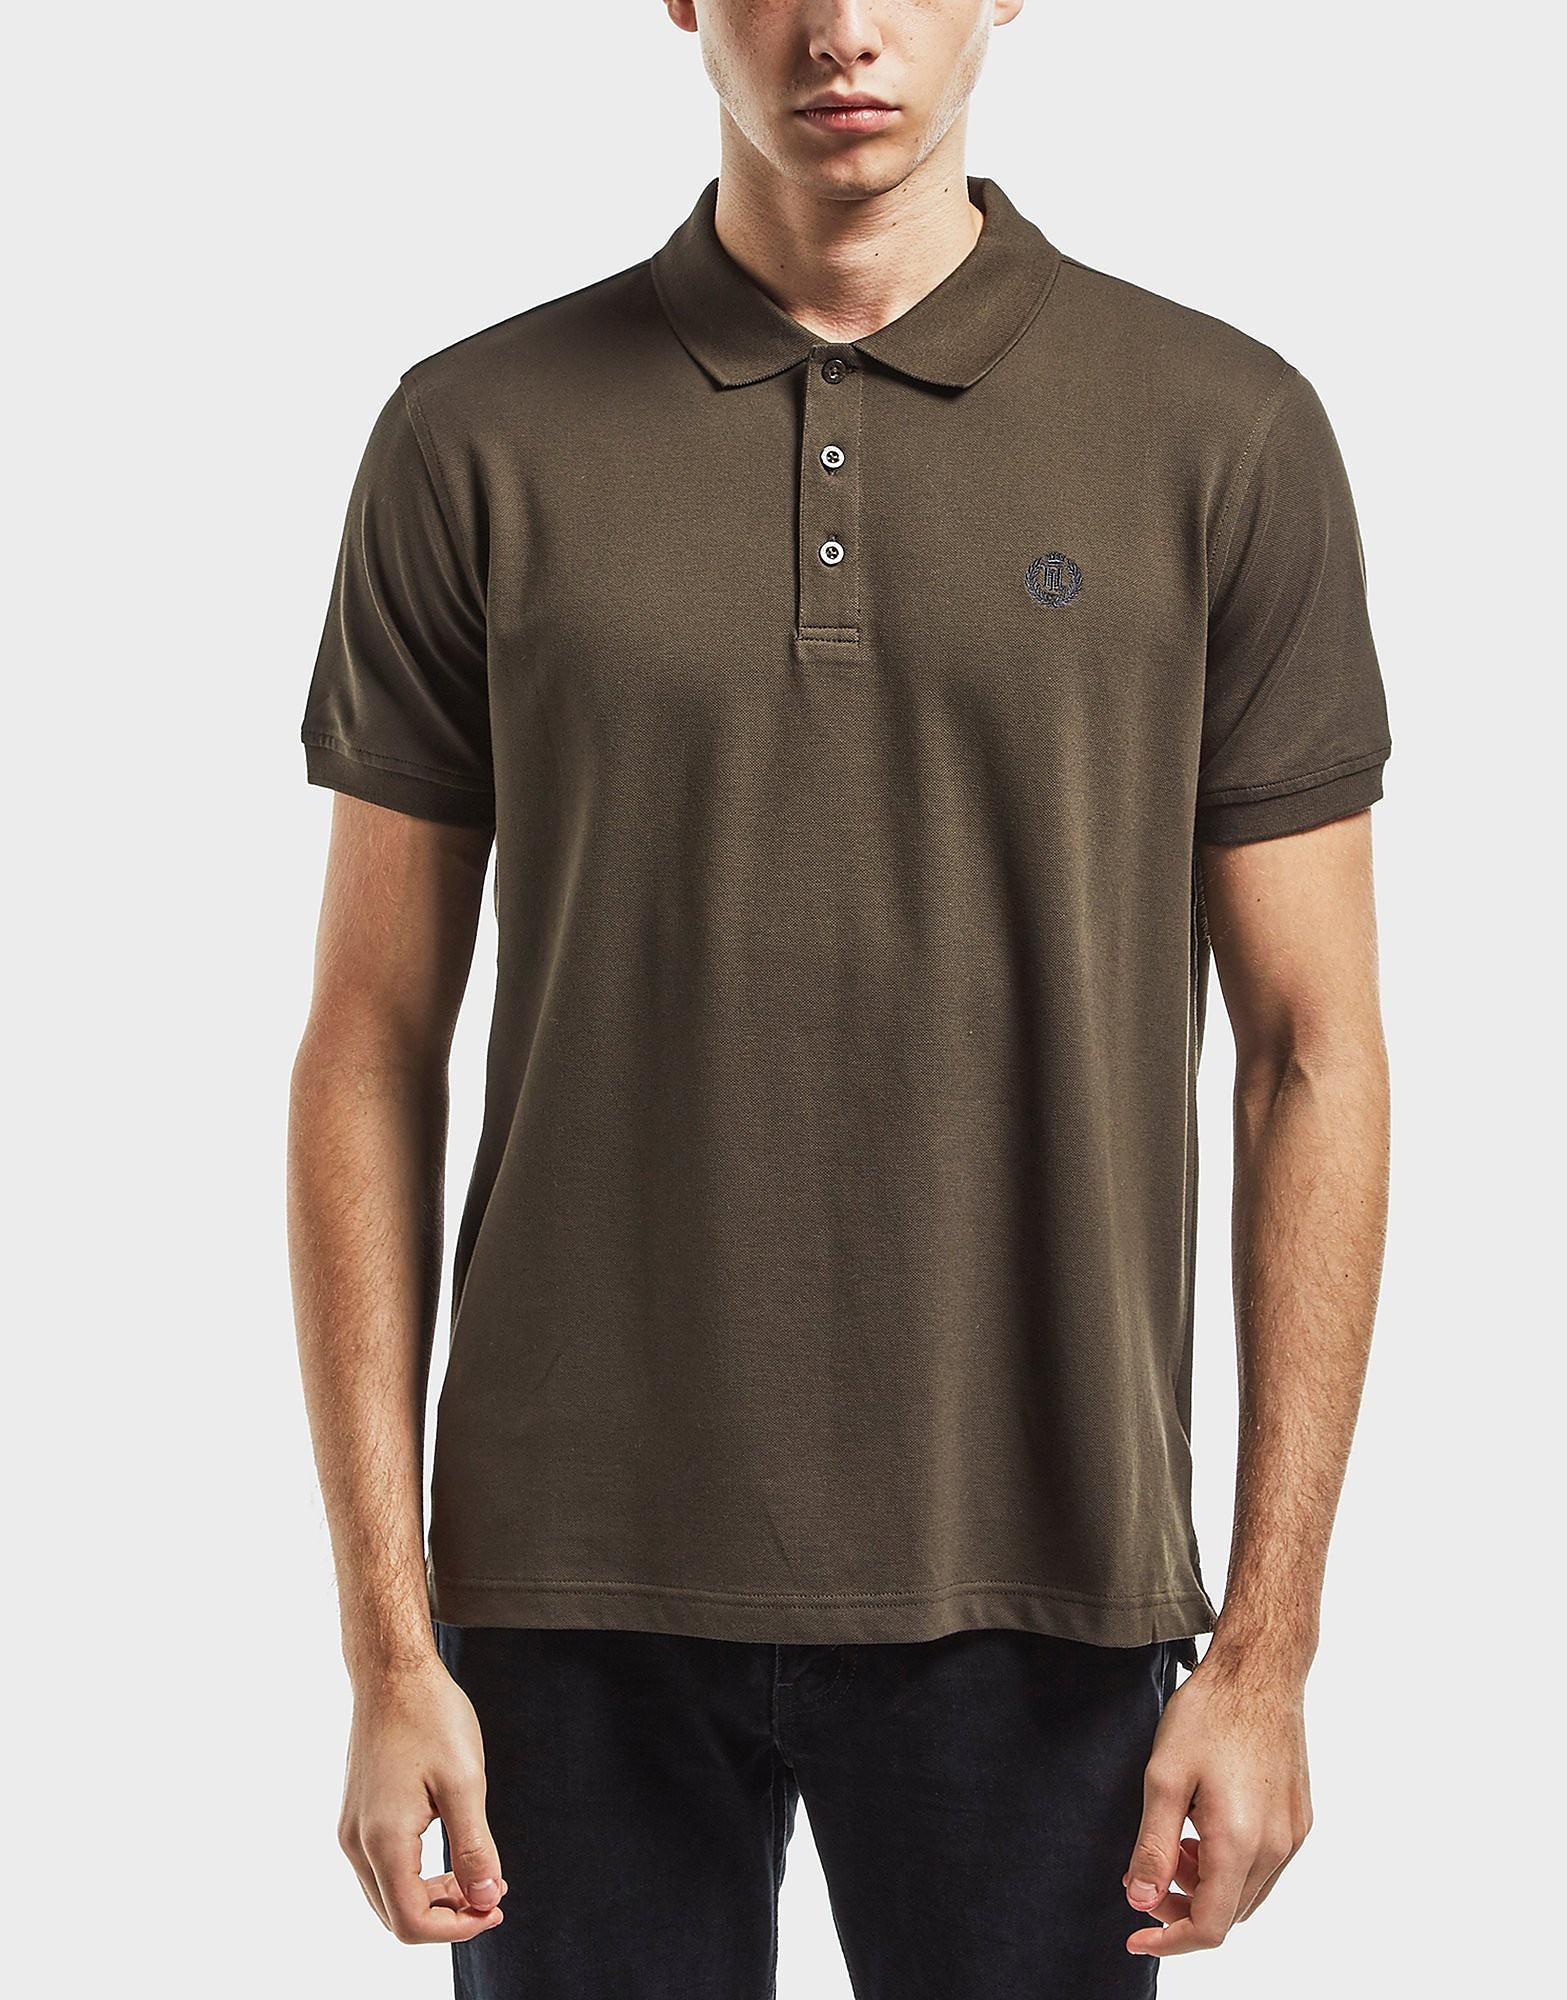 Henri Lloyd Cowes Short Sleeve T-Shirt